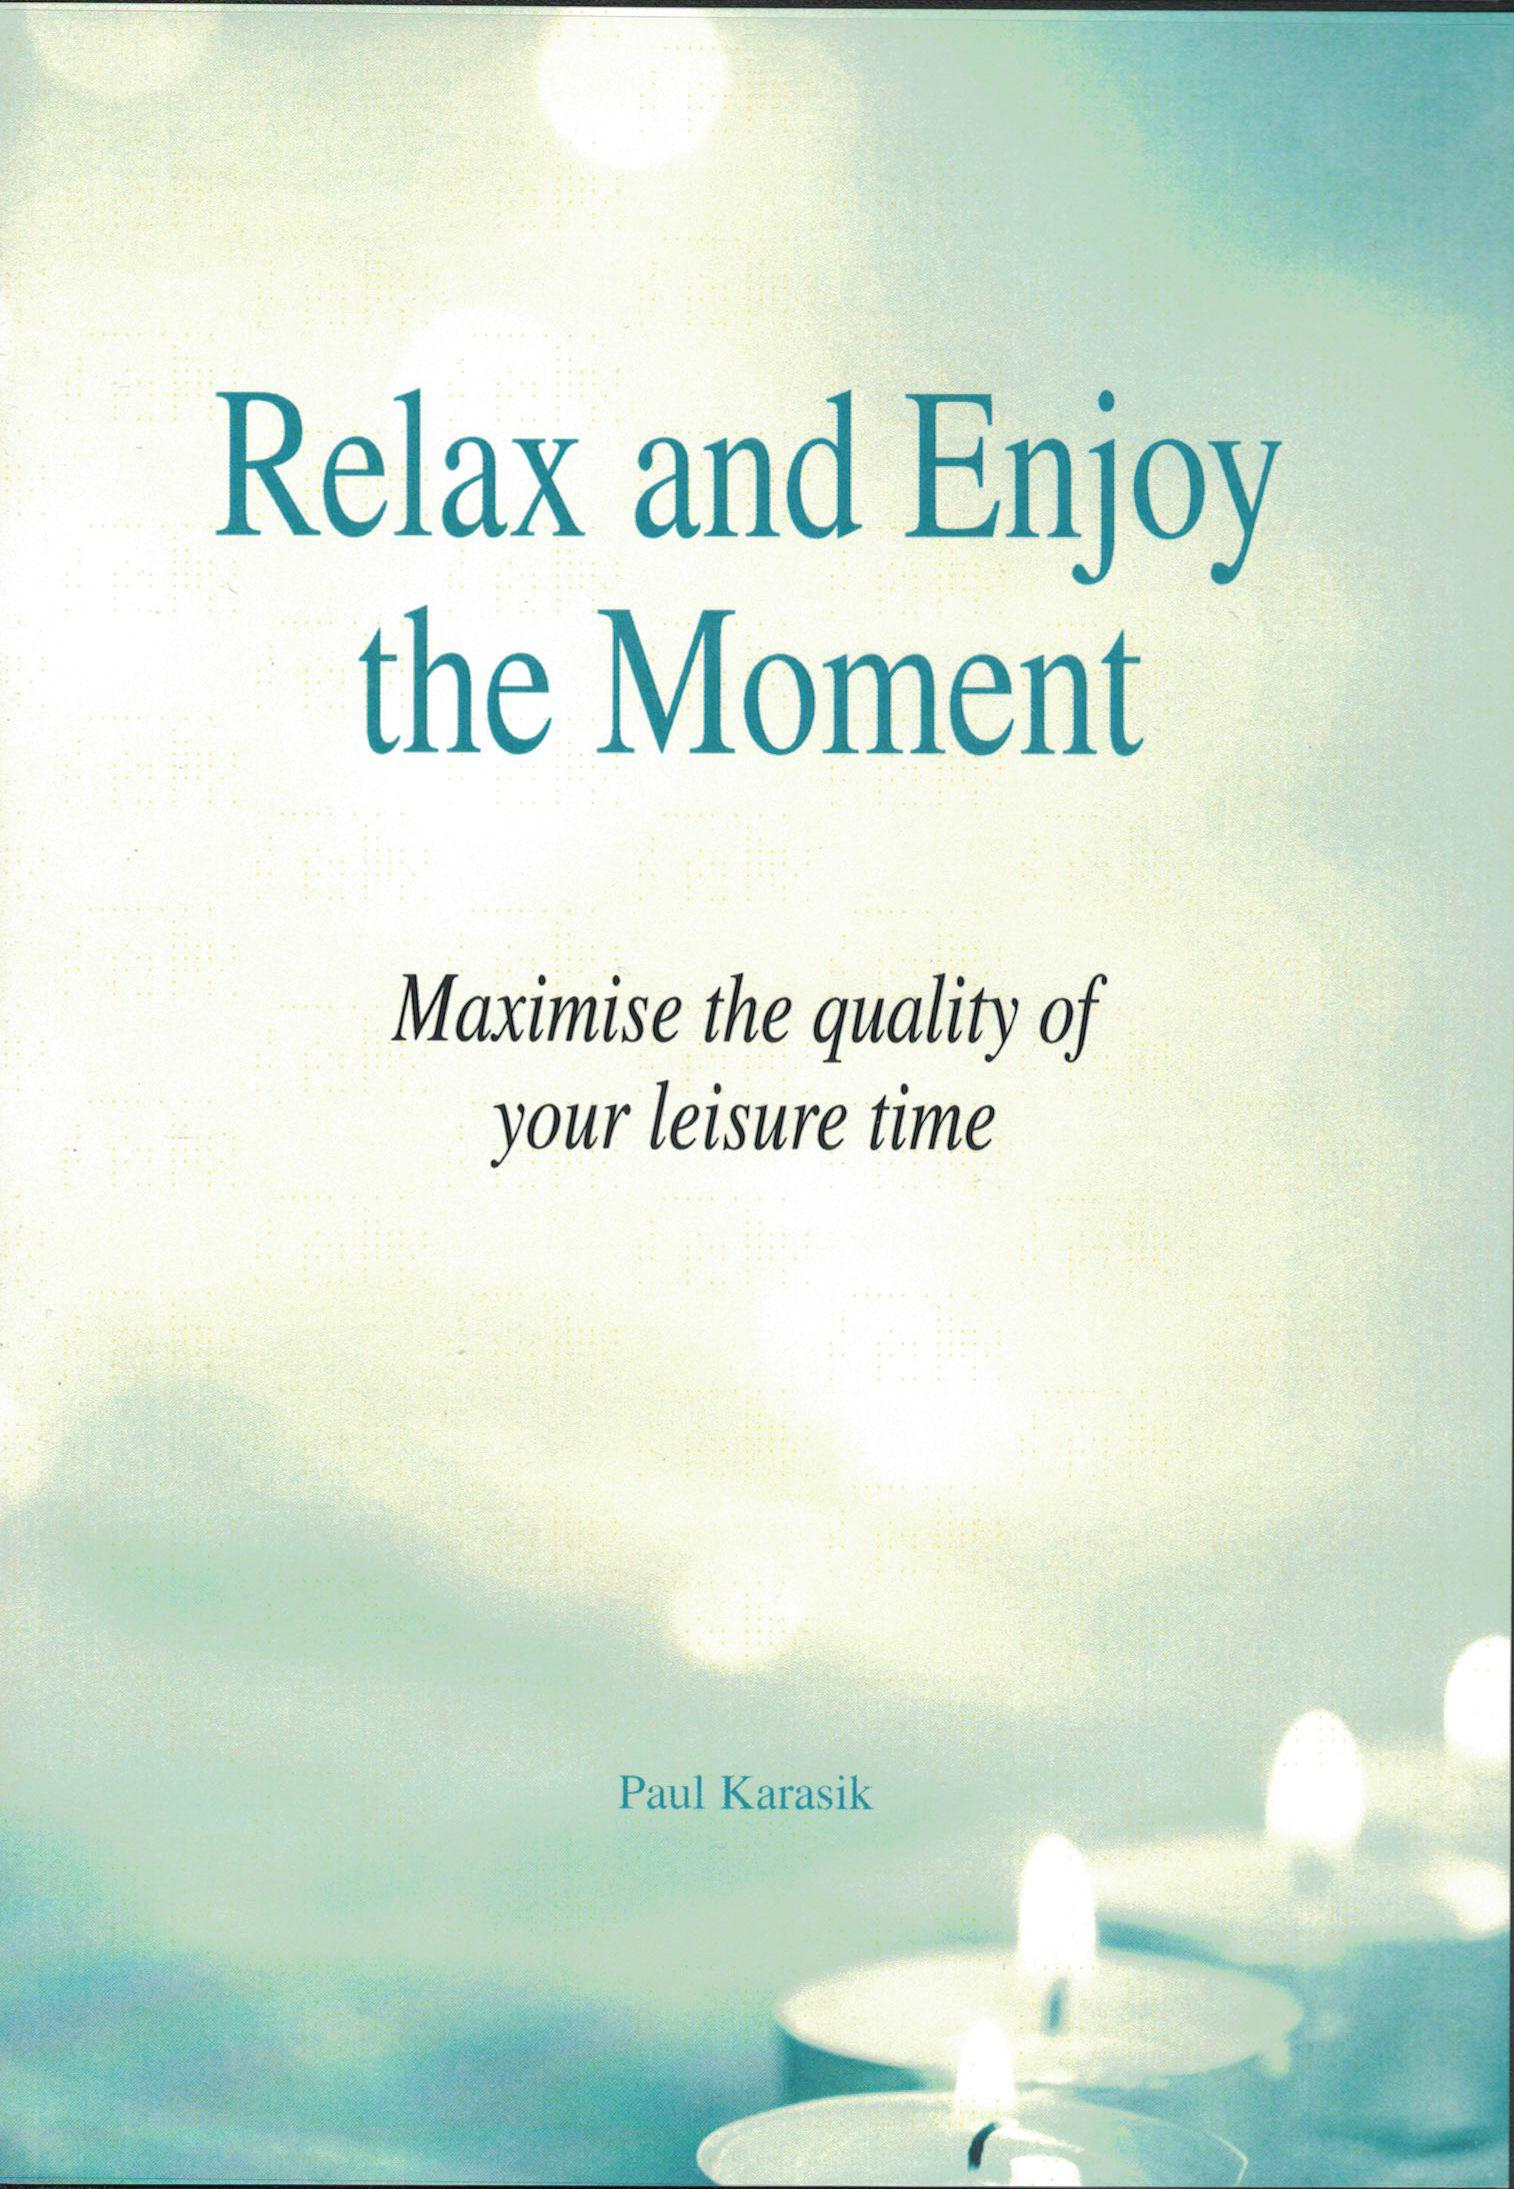 relax and enjoy the moment  u2013 cd program  u2013 paul karasik